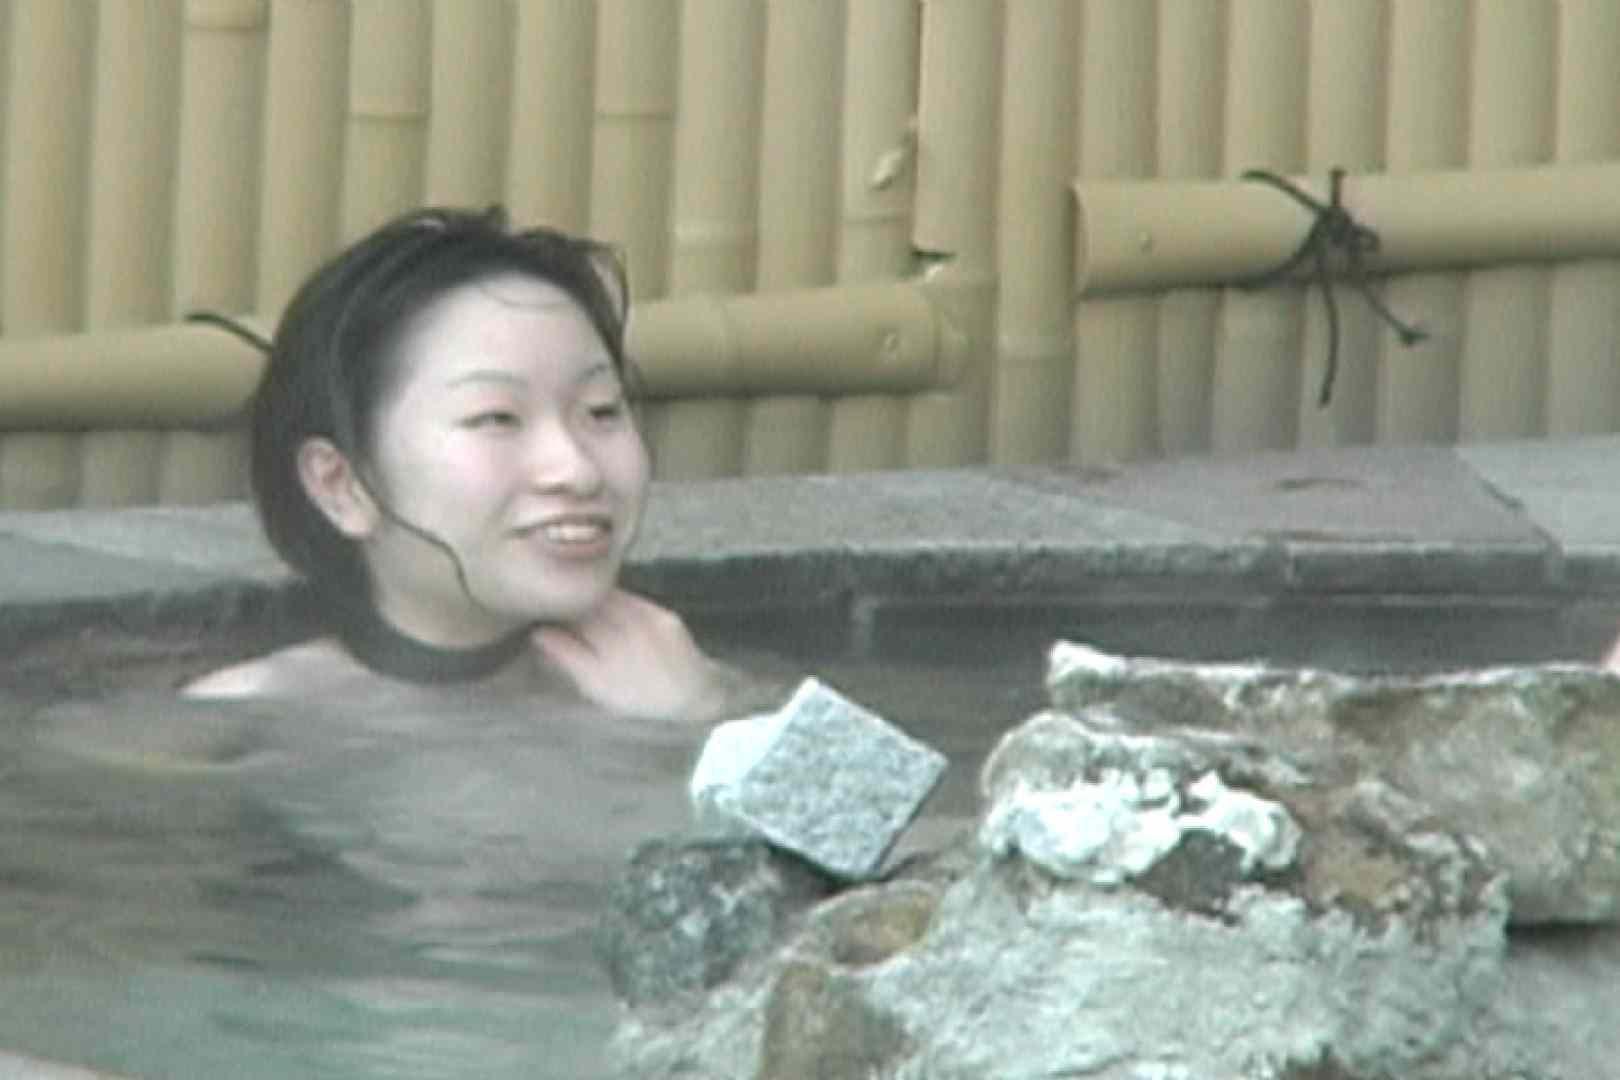 Aquaな露天風呂Vol.595 綺麗なOLたち エロ無料画像 112枚 101